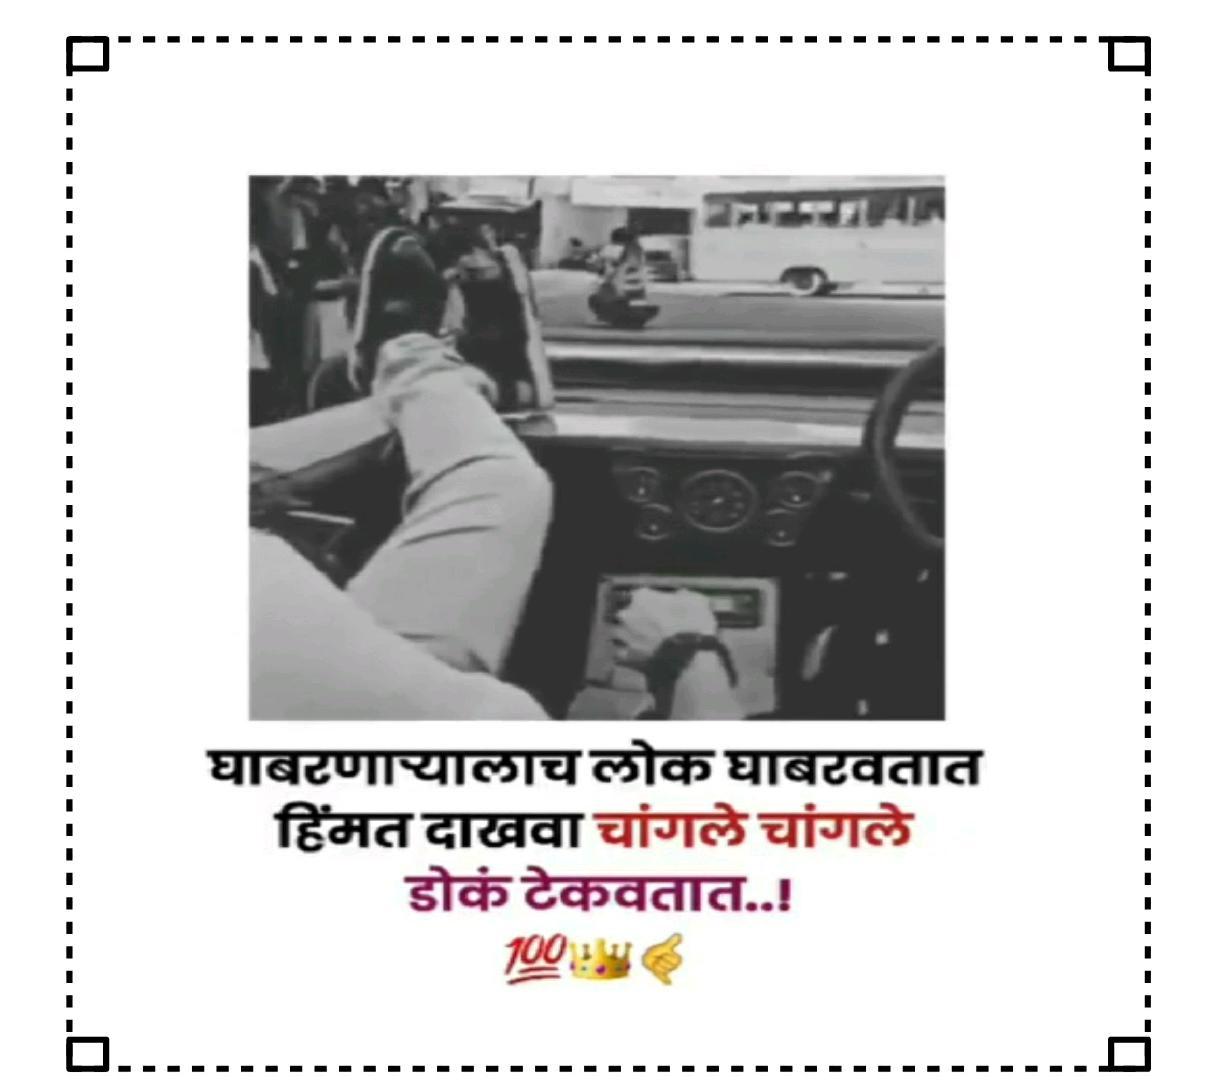 marathi attitude status bhaigiri Marathi attitude status for boy text Fb marathi attitude